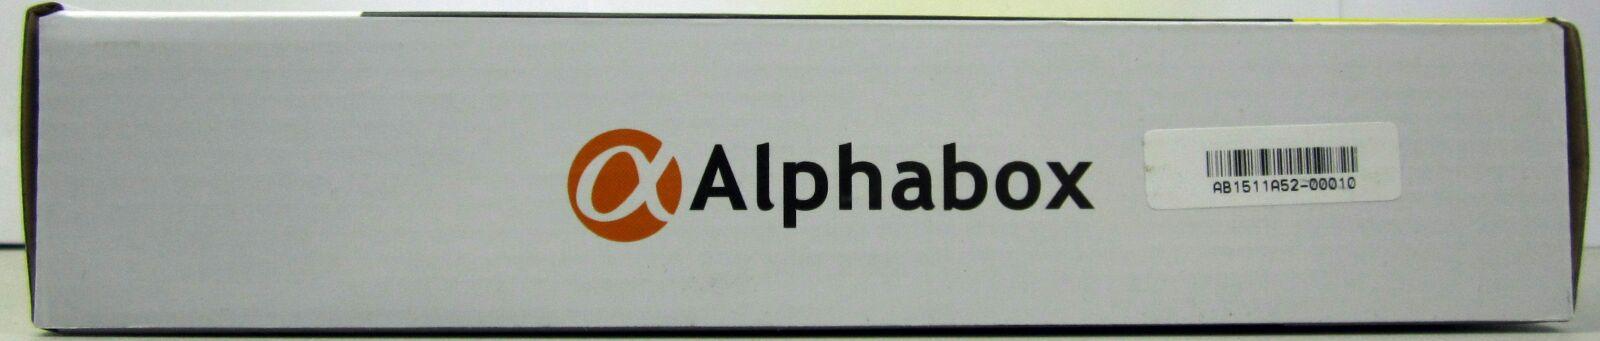 Alpha HD box | Austino communication nig ltd